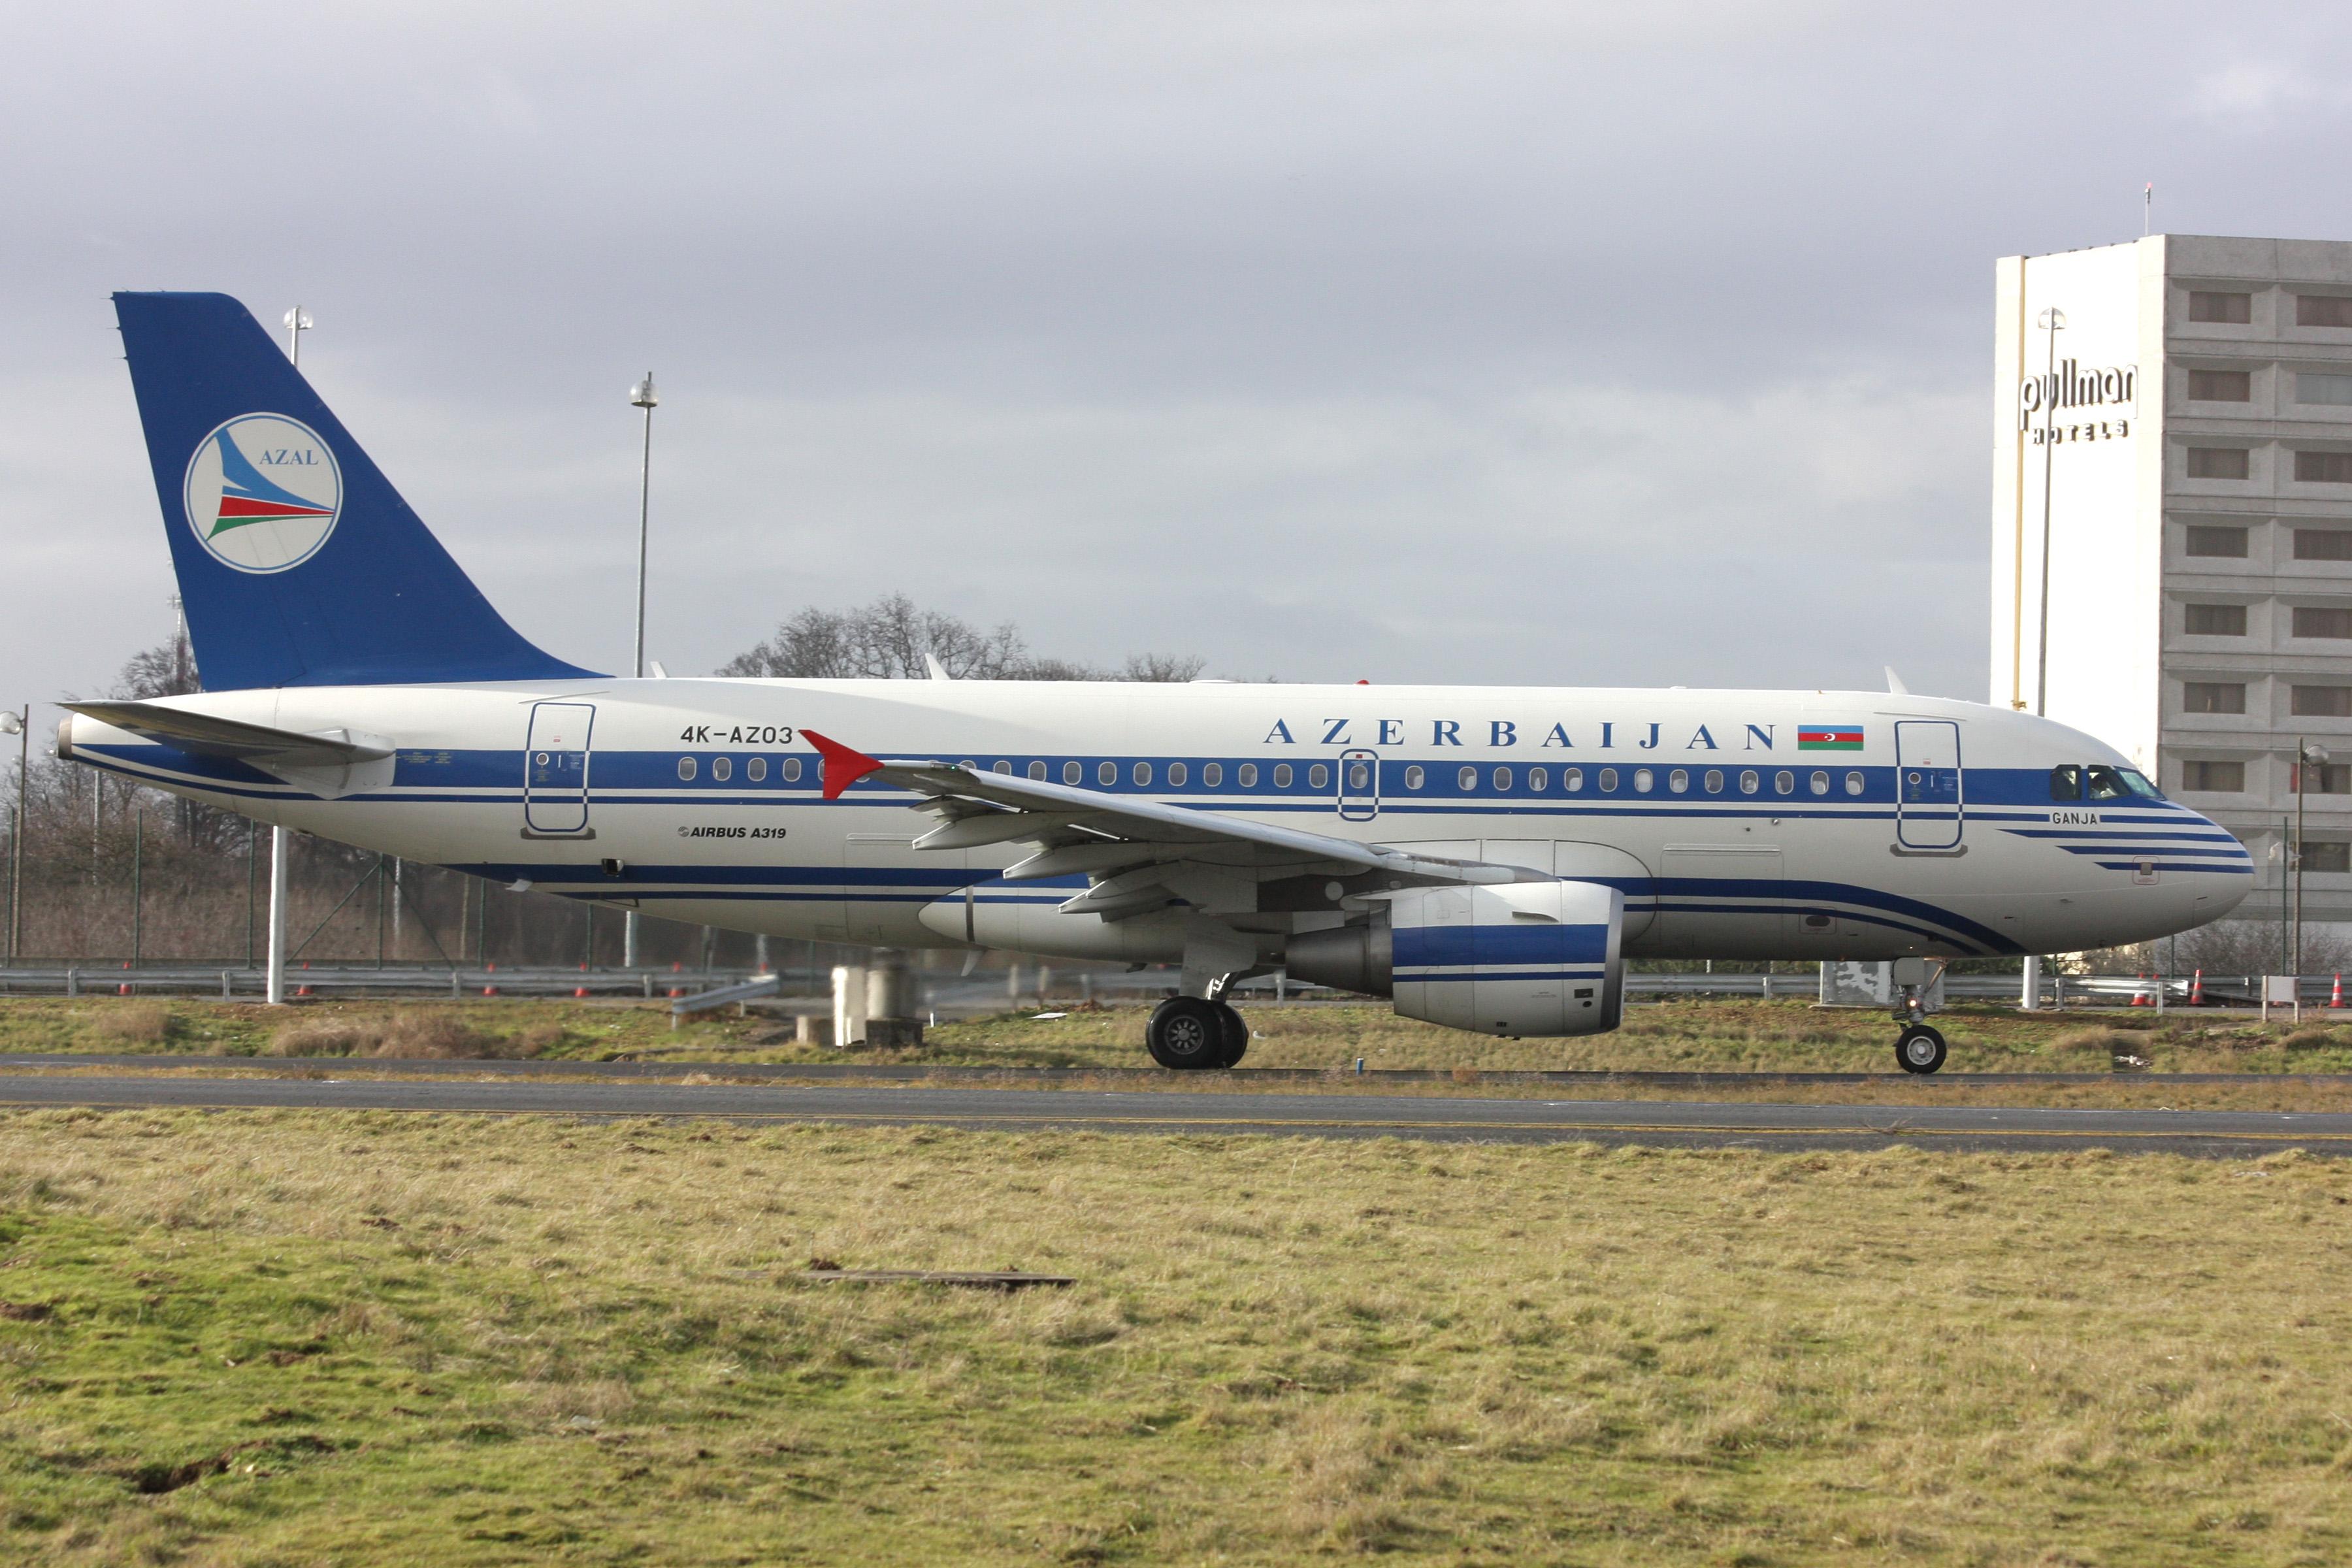 Azerbaijan Airlines Flight 217